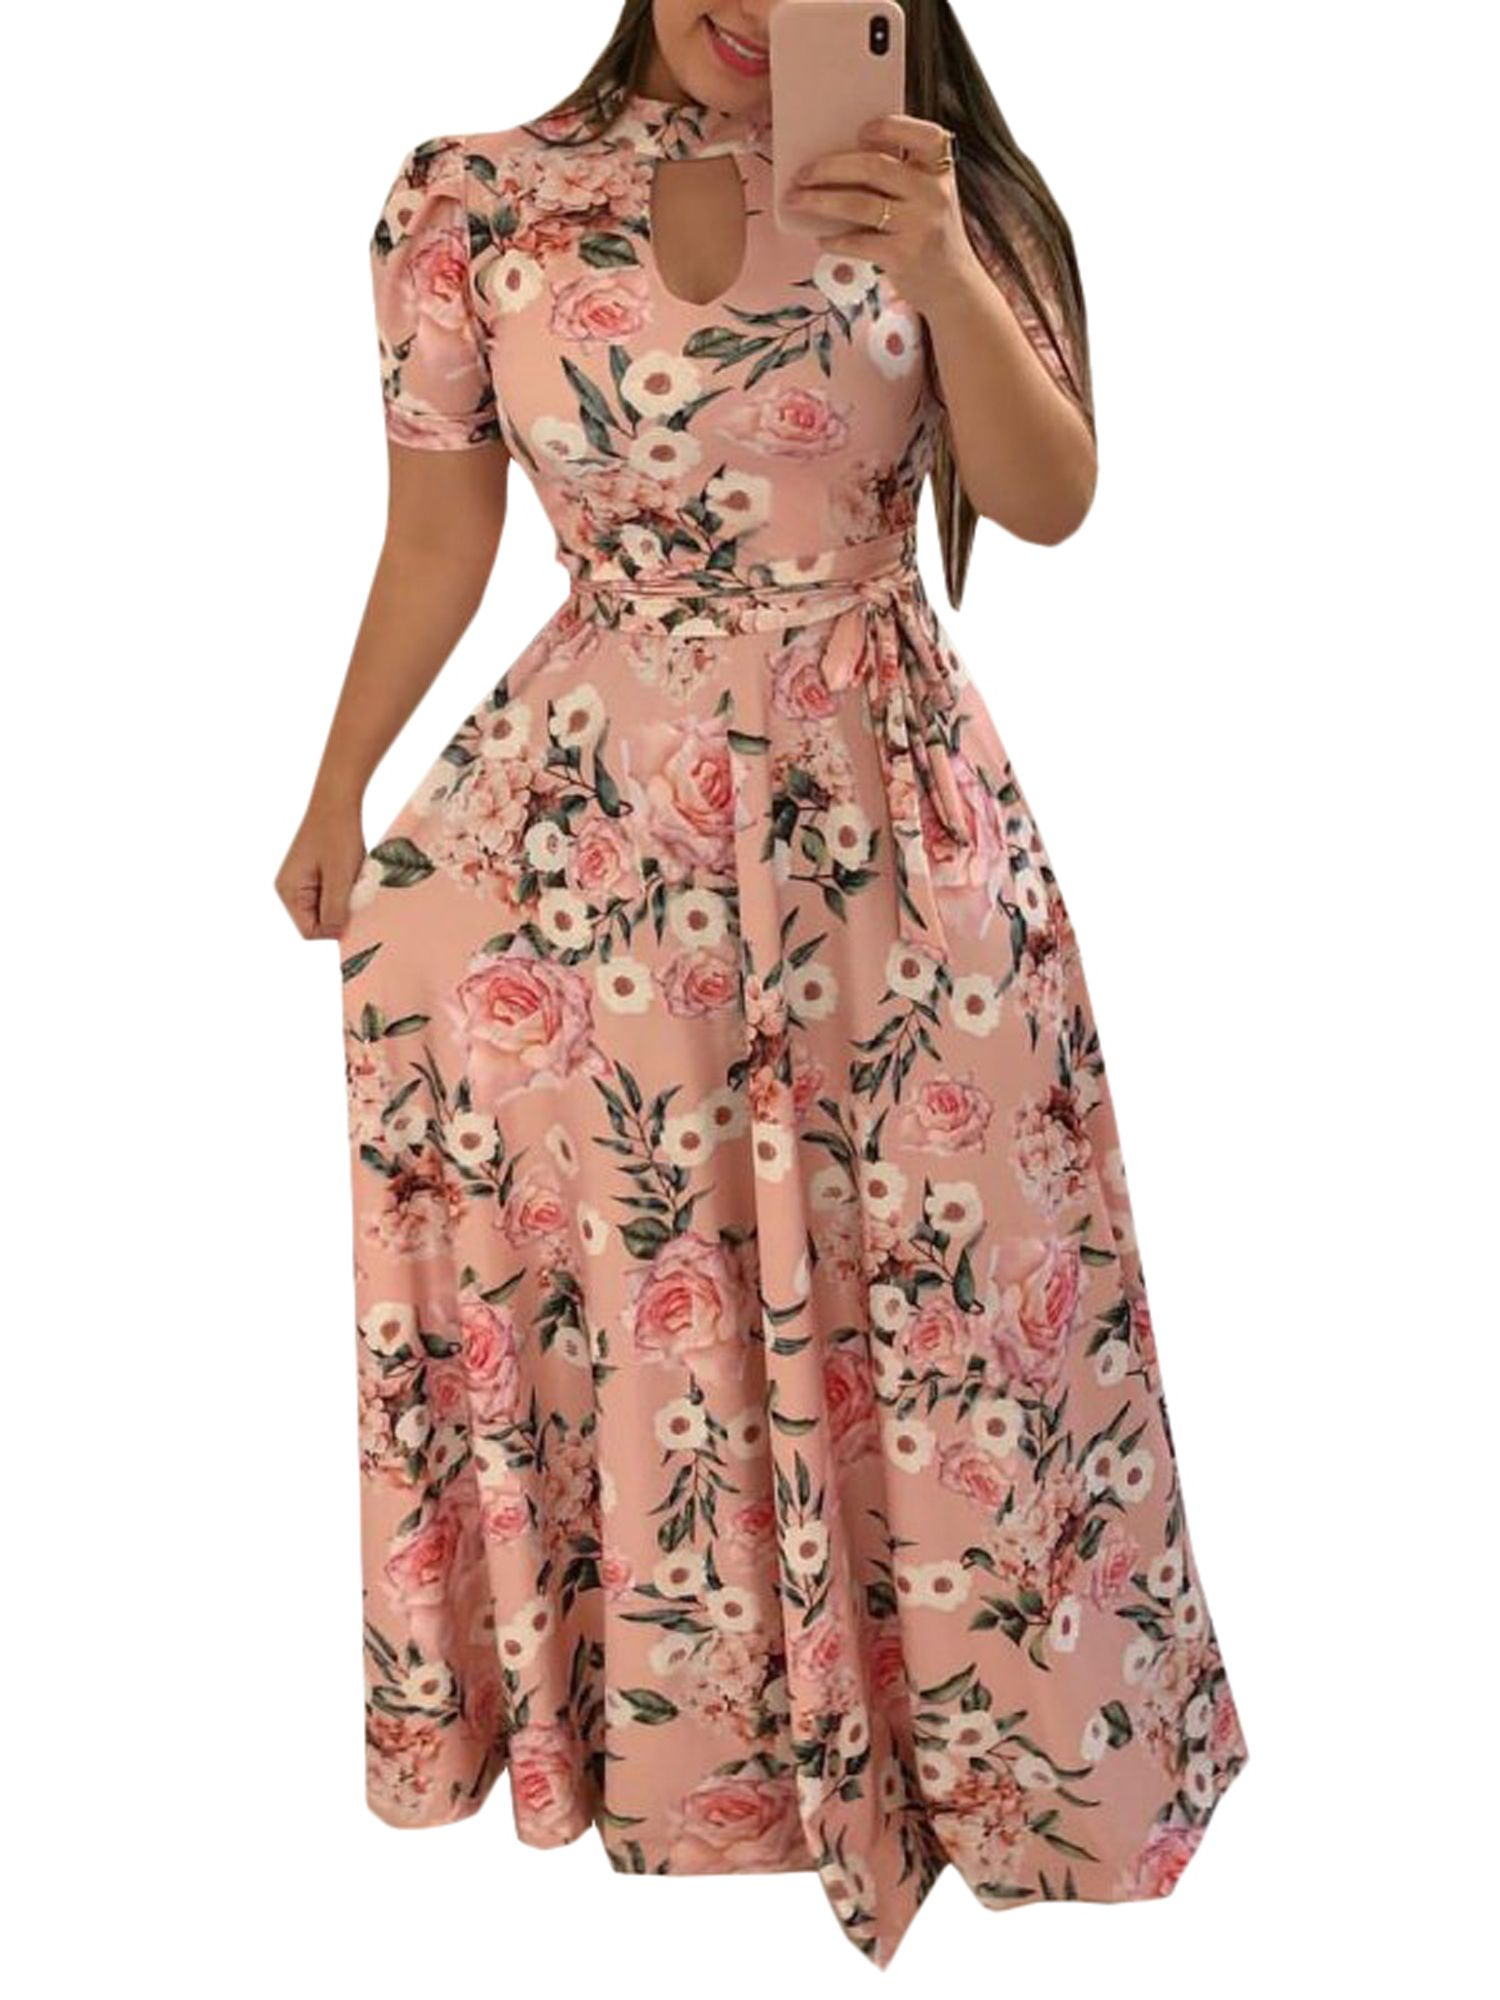 Lallc Women S Plus Size Boho Floral Short Sleeve Polka Dot Party Long Maxi Dress Walmart Com Vintage Long Dress Maxi Dress Boho Maxi Dress [ 2000 x 1500 Pixel ]